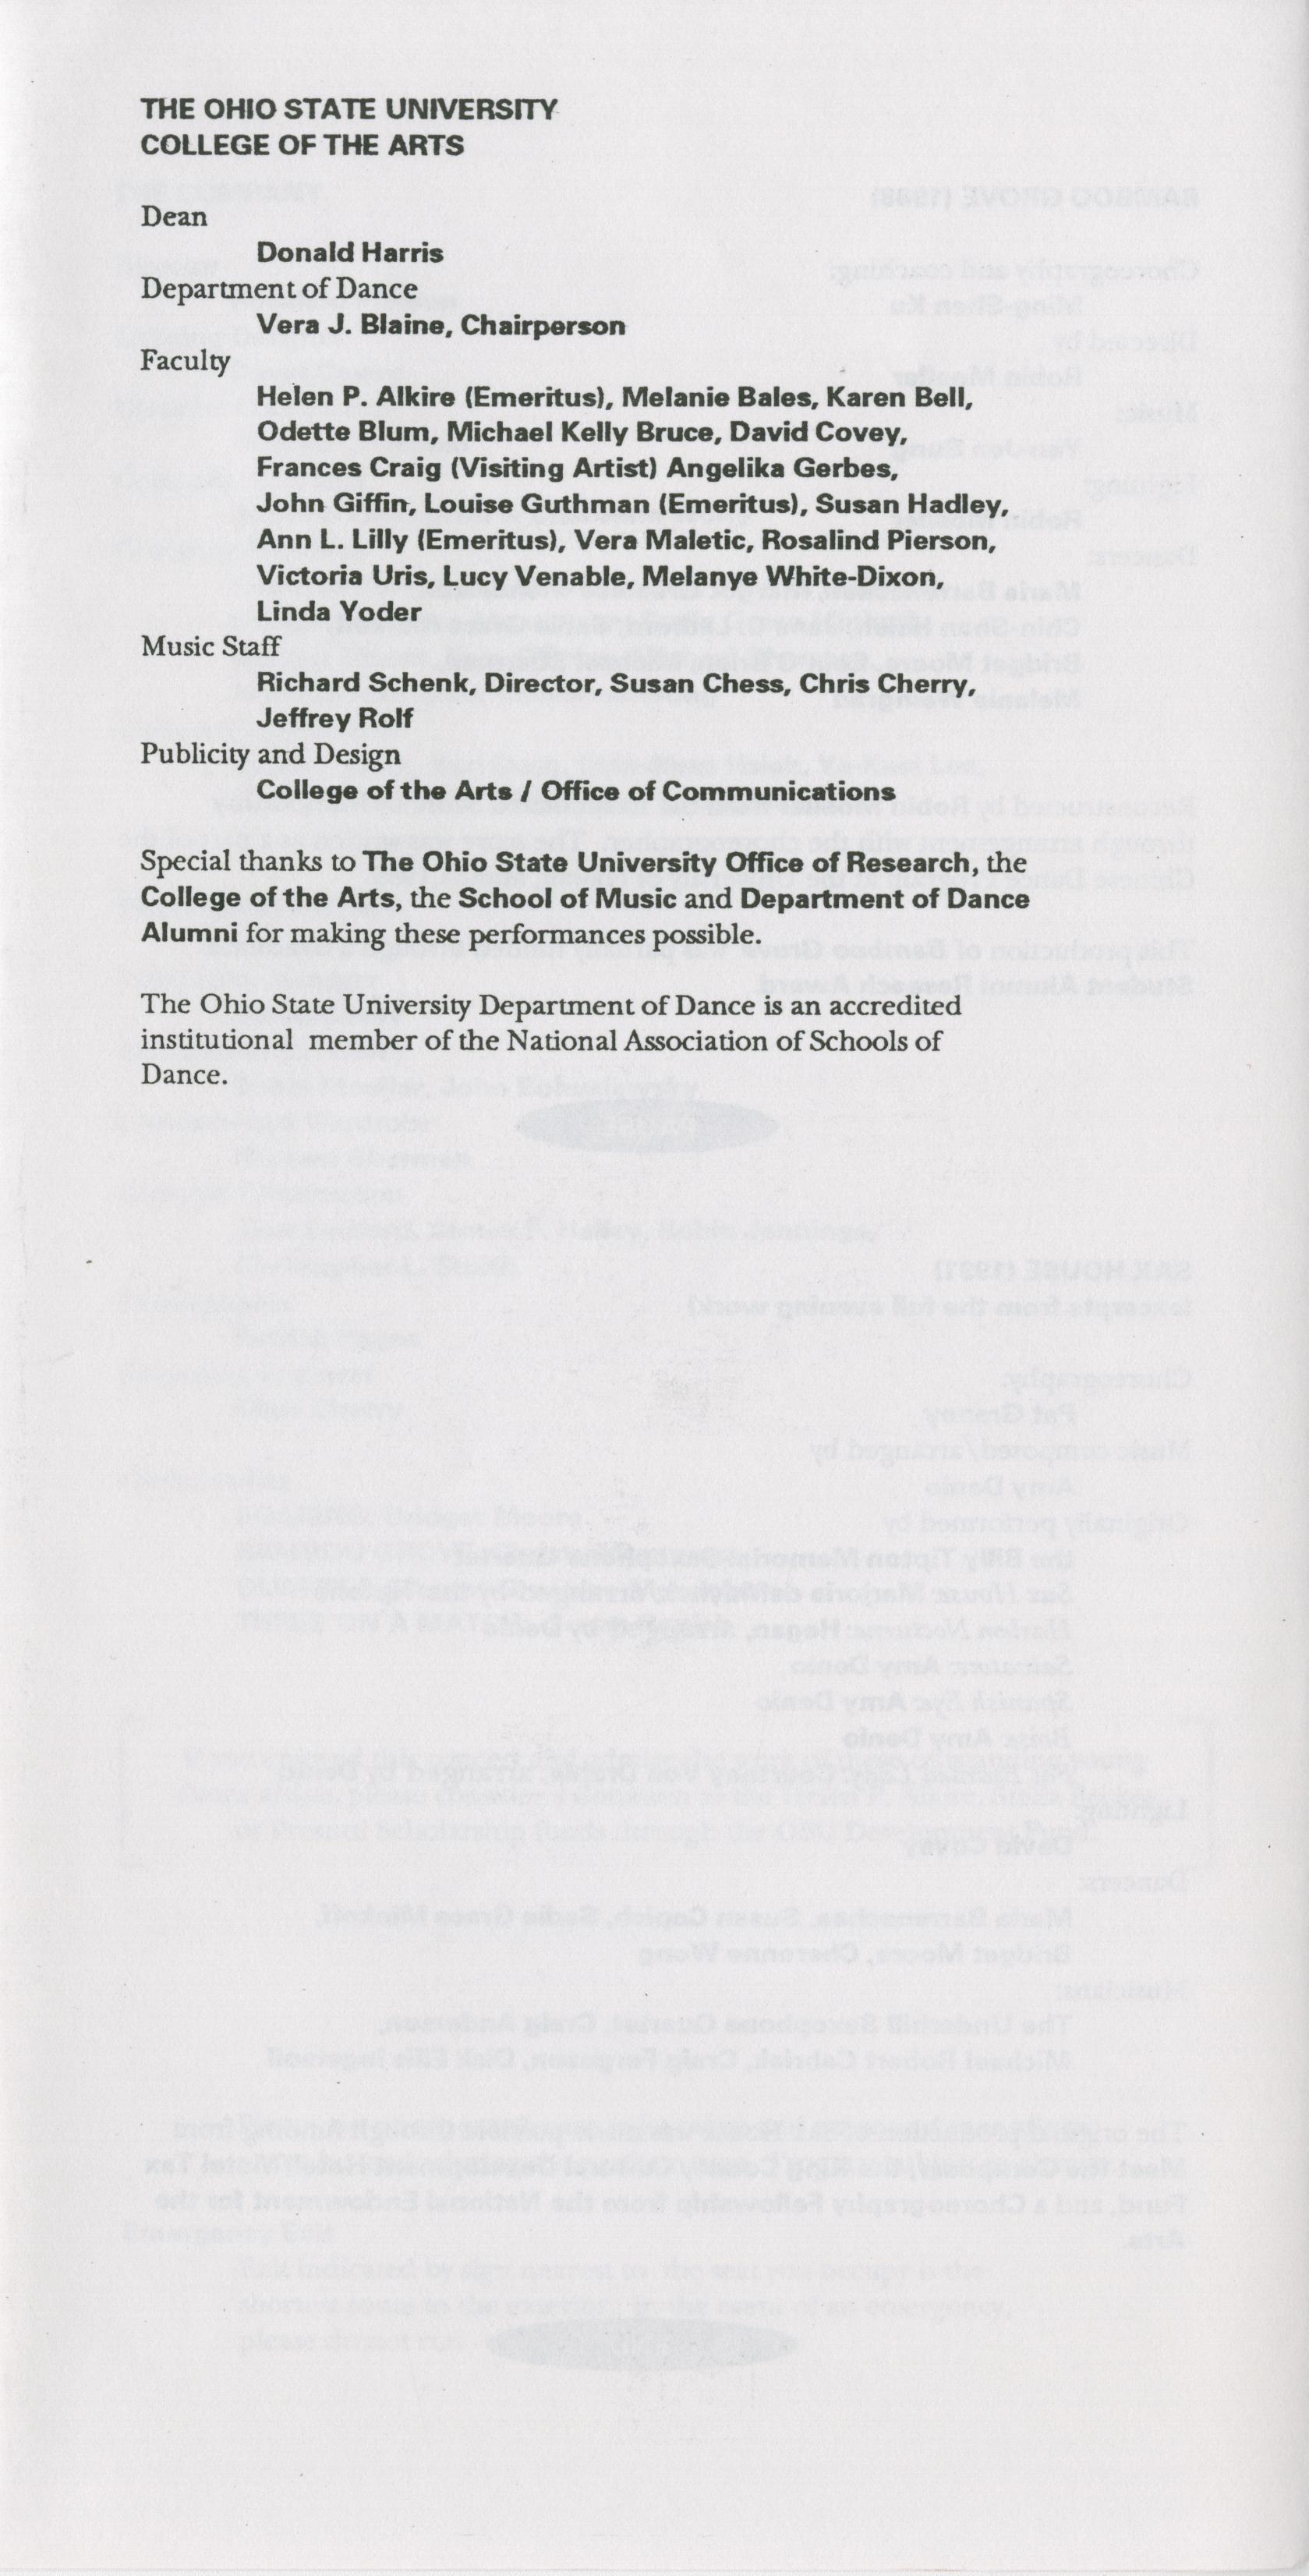 UDC_1992.2_DancePrograms-022-004.jpg